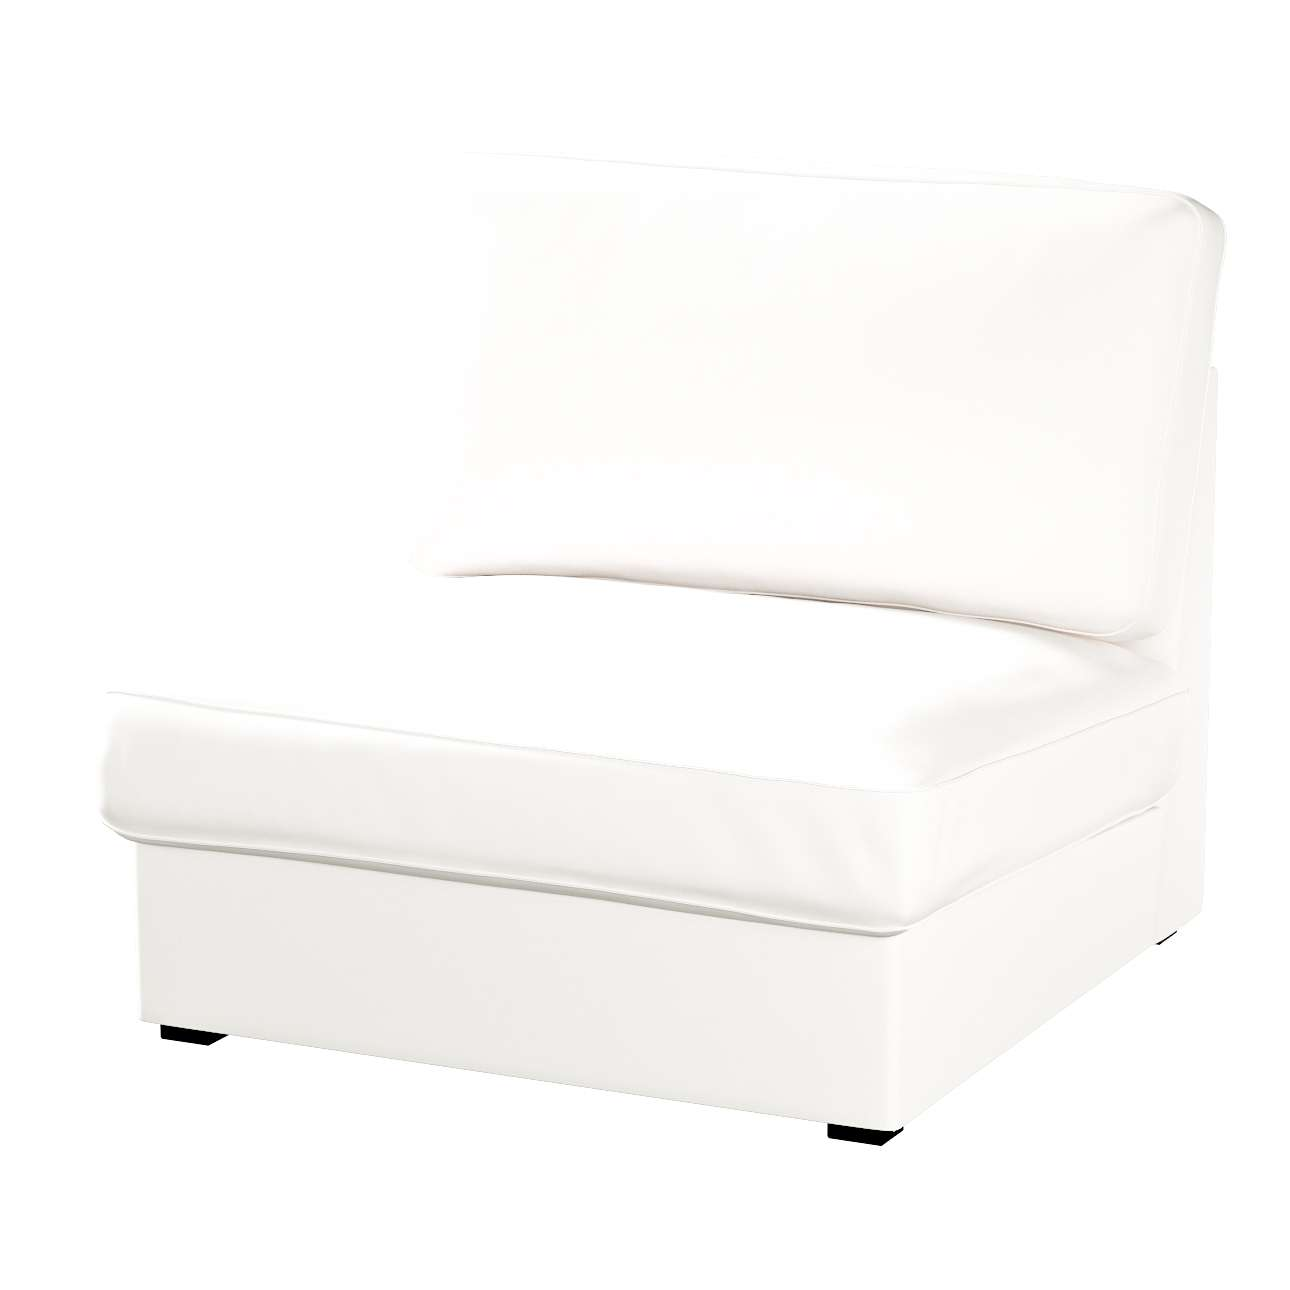 Pokrowiec na fotel Kivik Fotel Kivik w kolekcji Cotton Panama, tkanina: 702-34